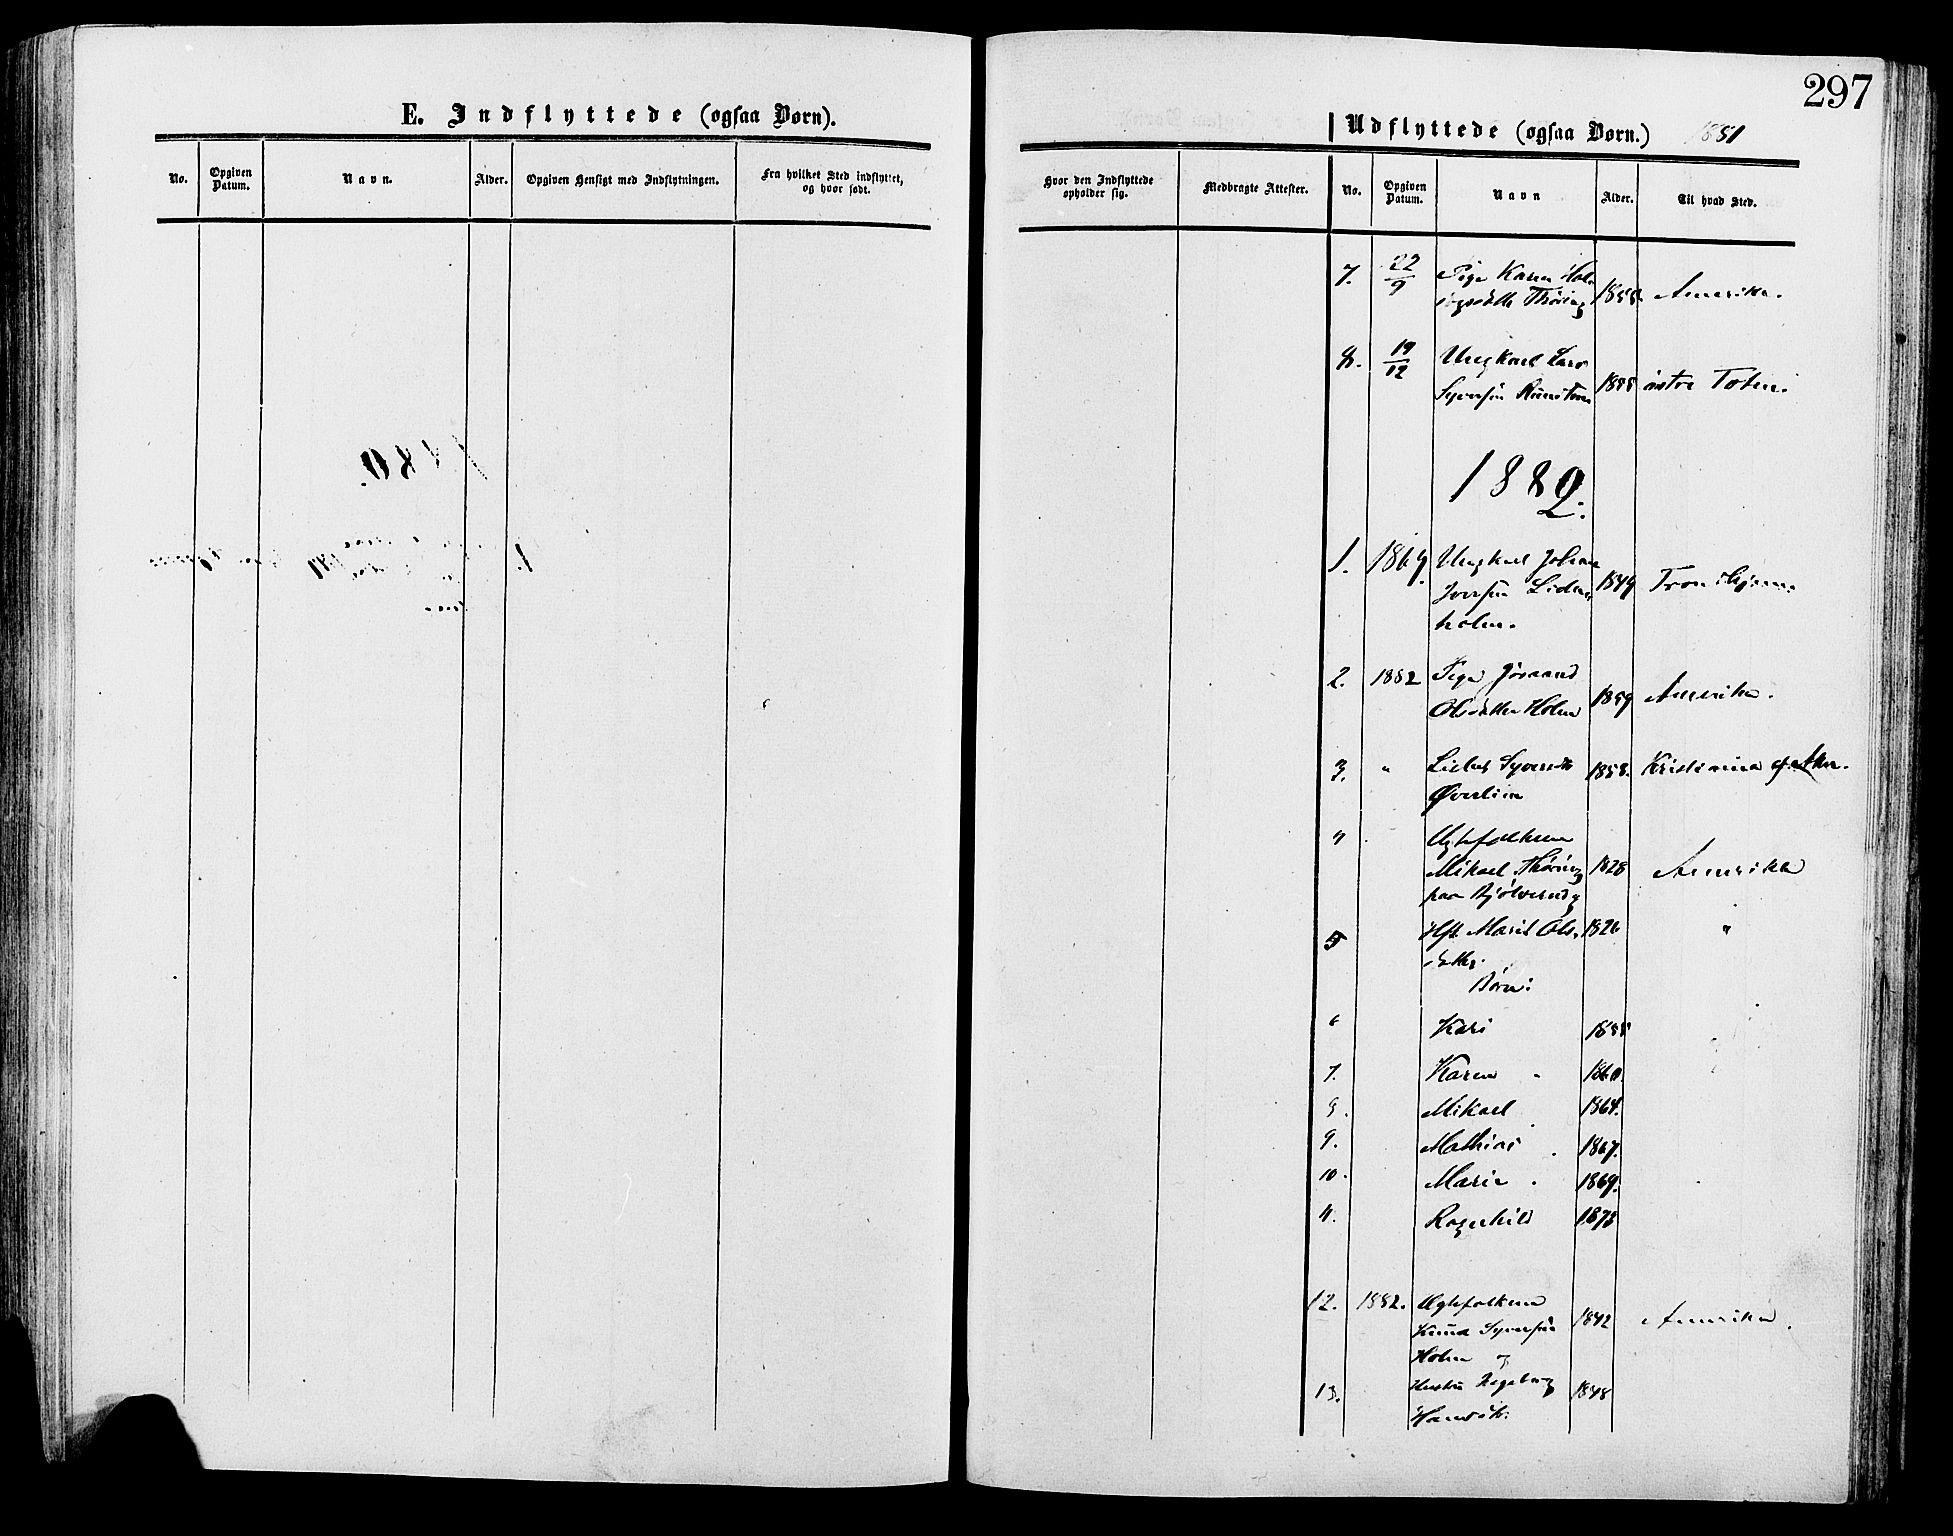 SAH, Lesja prestekontor, Ministerialbok nr. 9, 1854-1889, s. 297